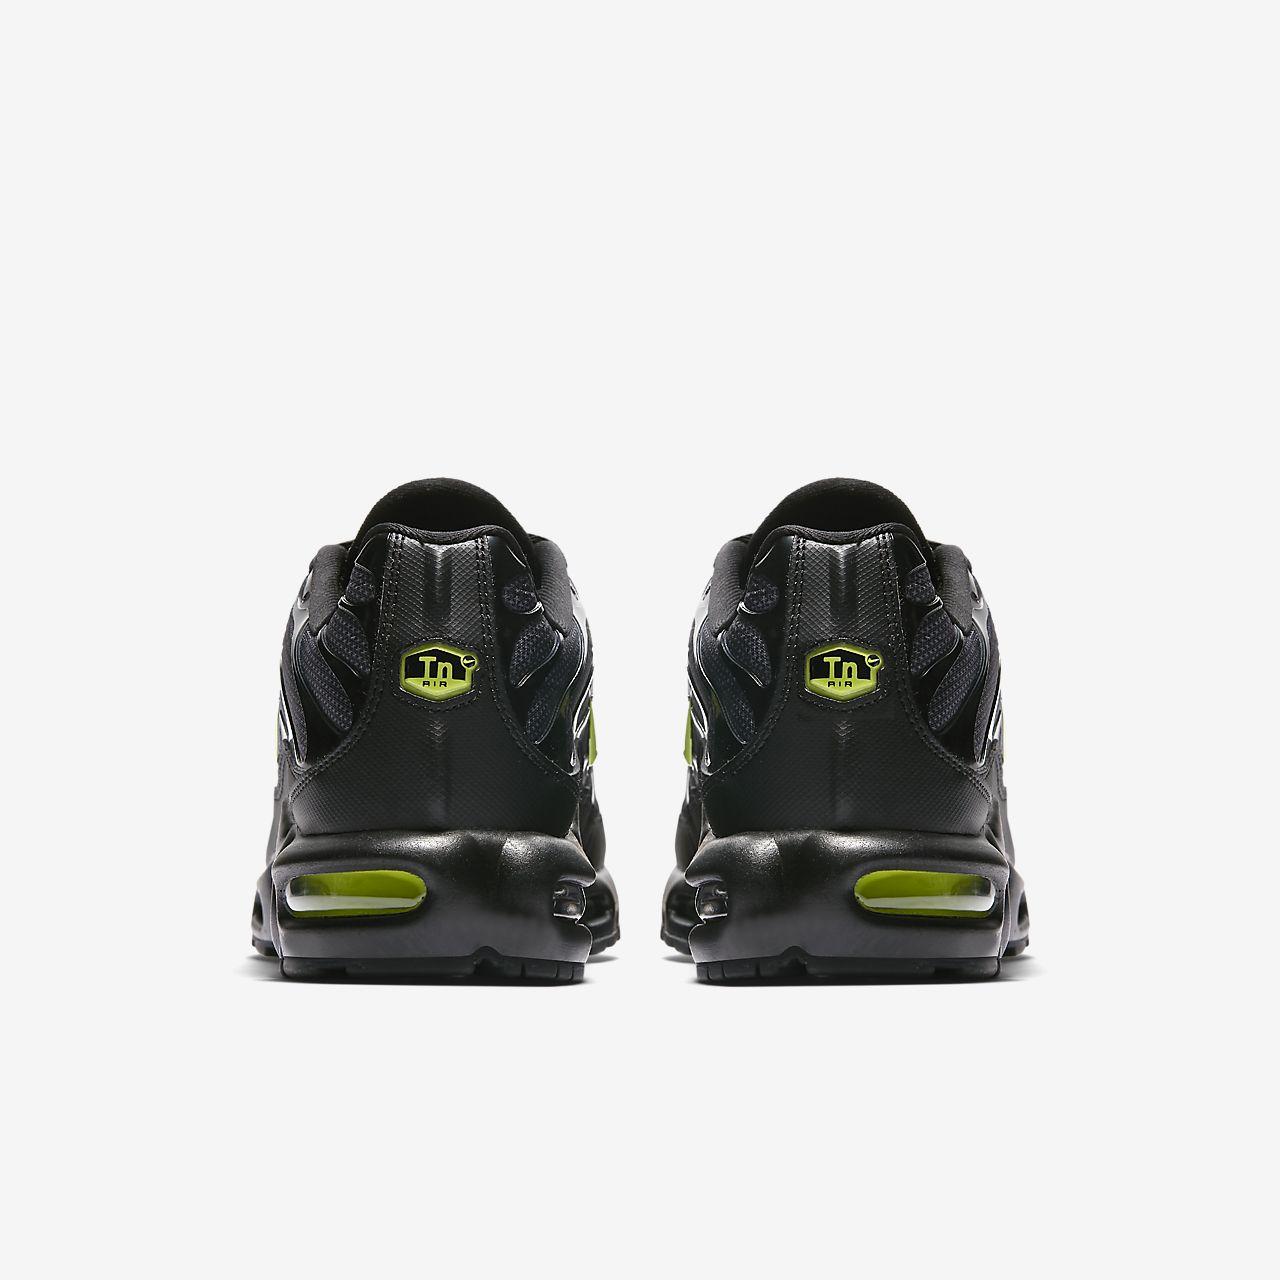 scarpa nike air max plus se nerowolf greyvolt glow aj2013 001